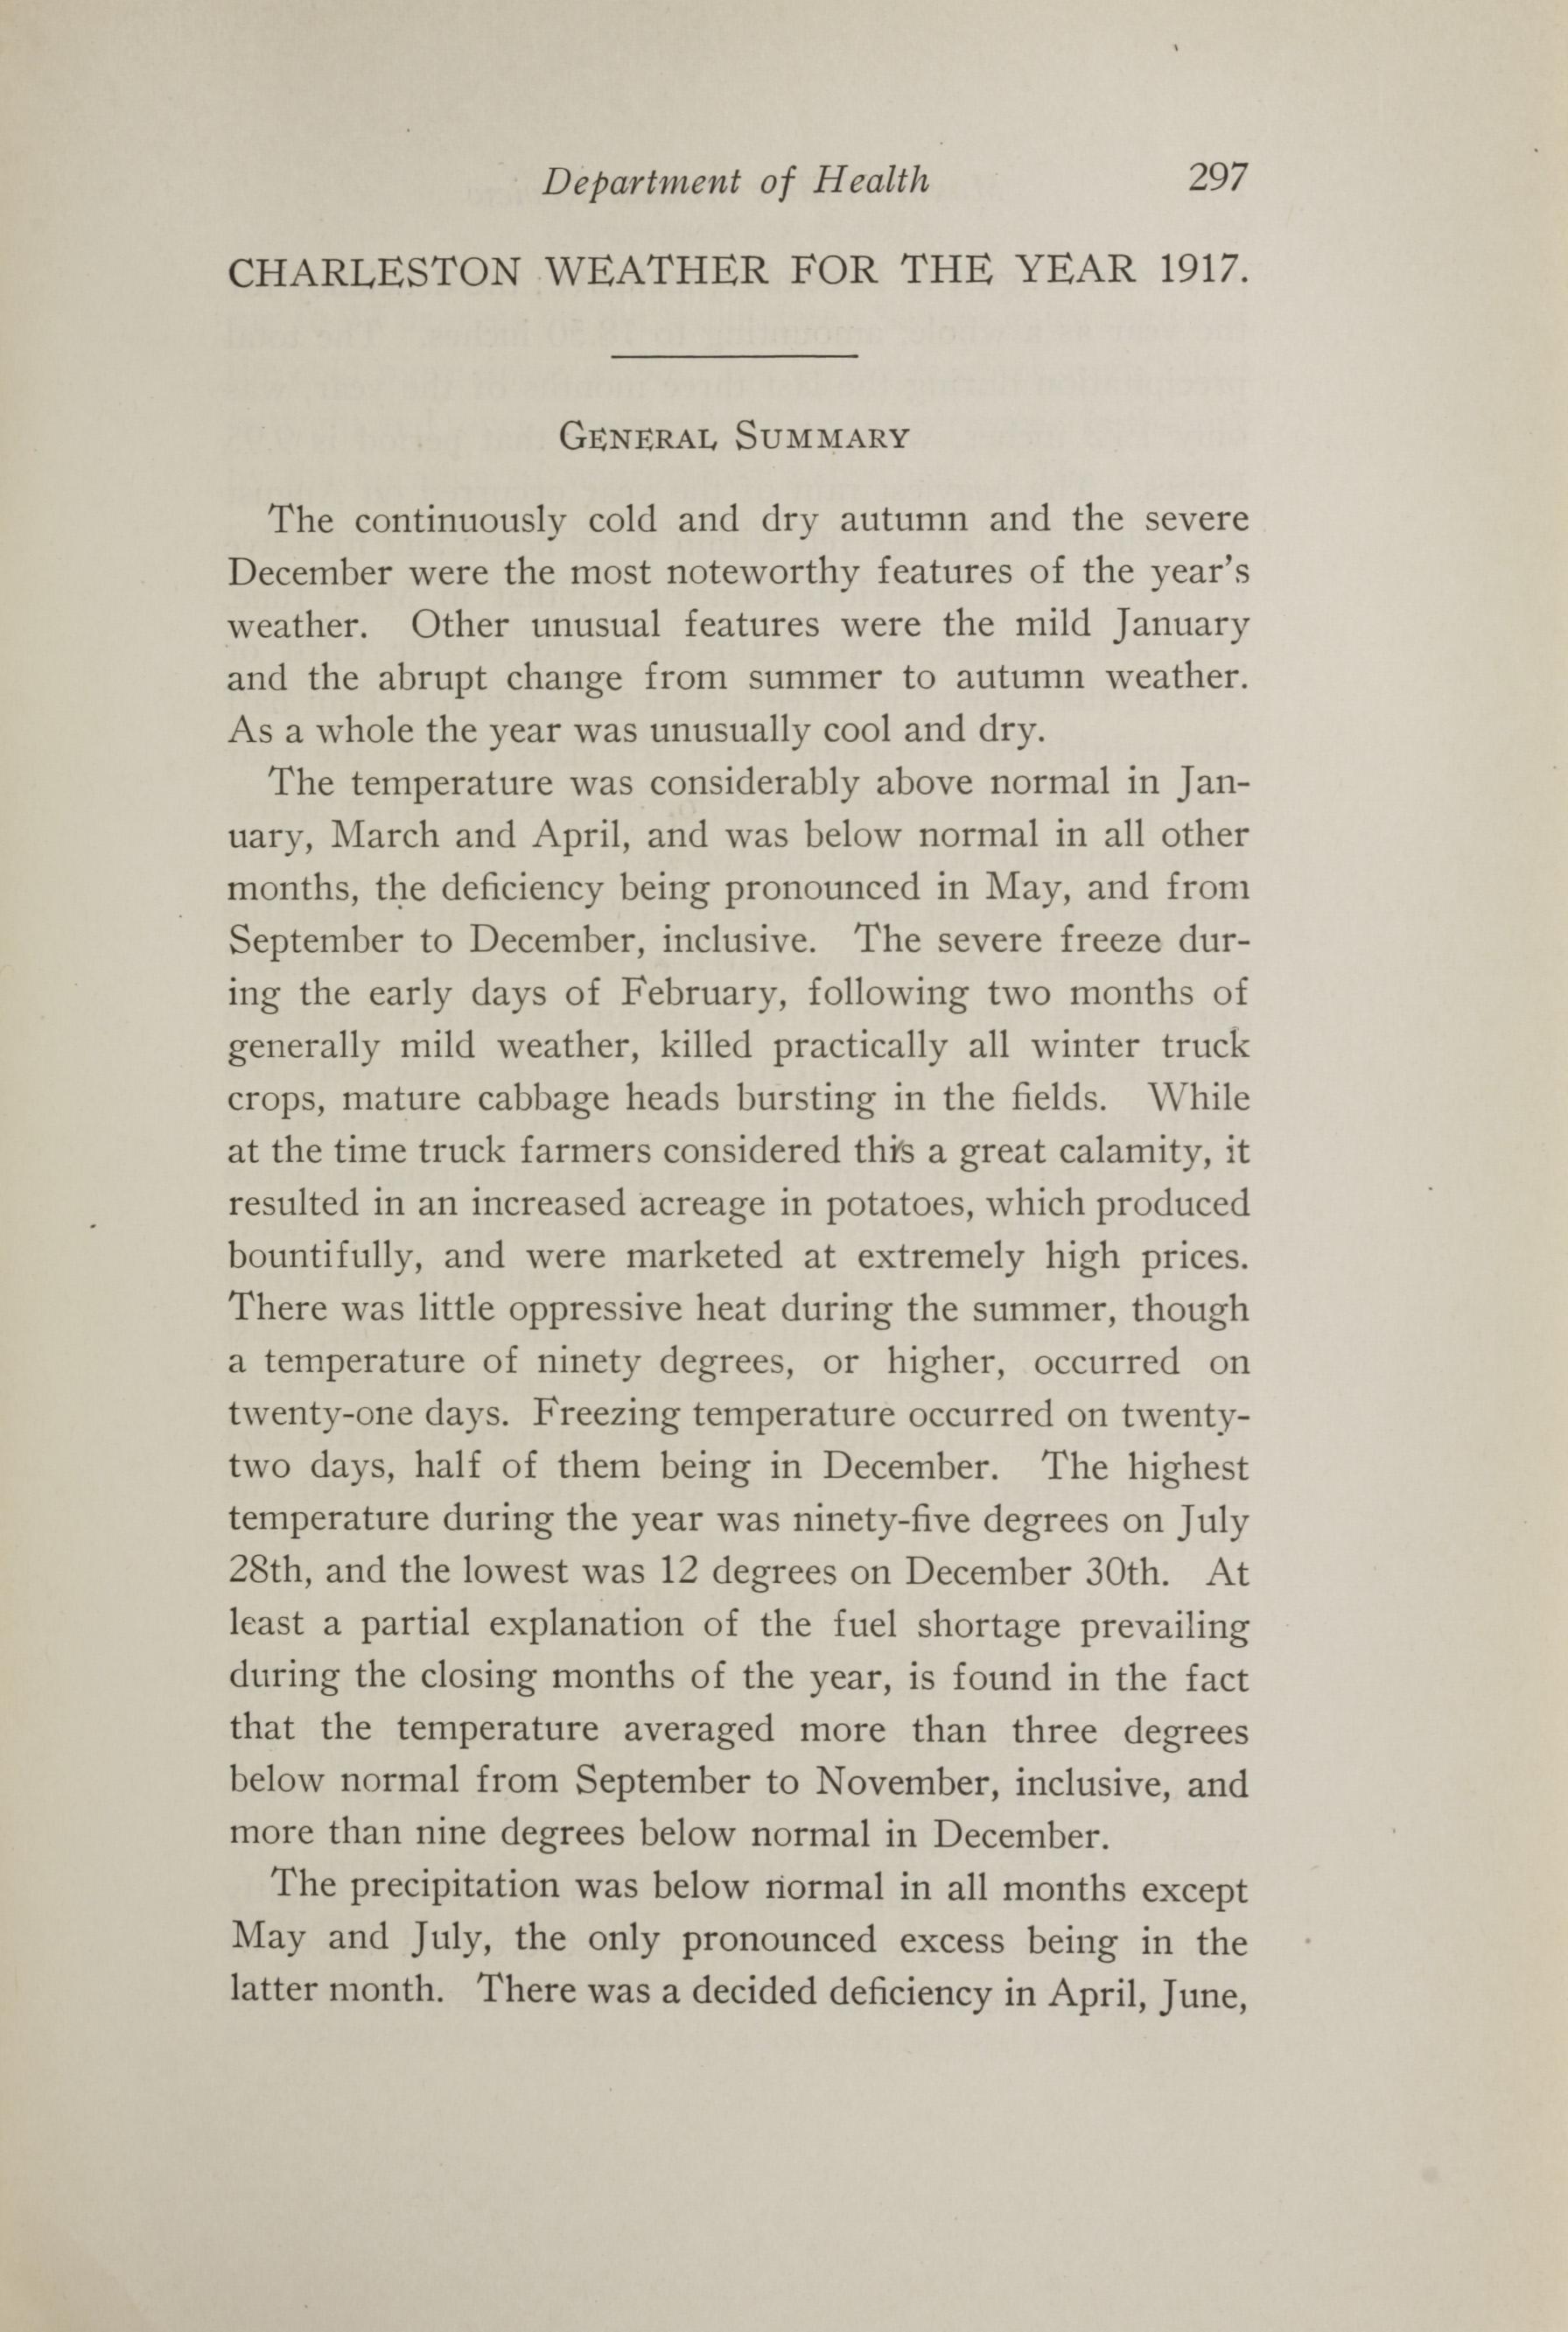 Charleston Yearbook, 1917, page 297